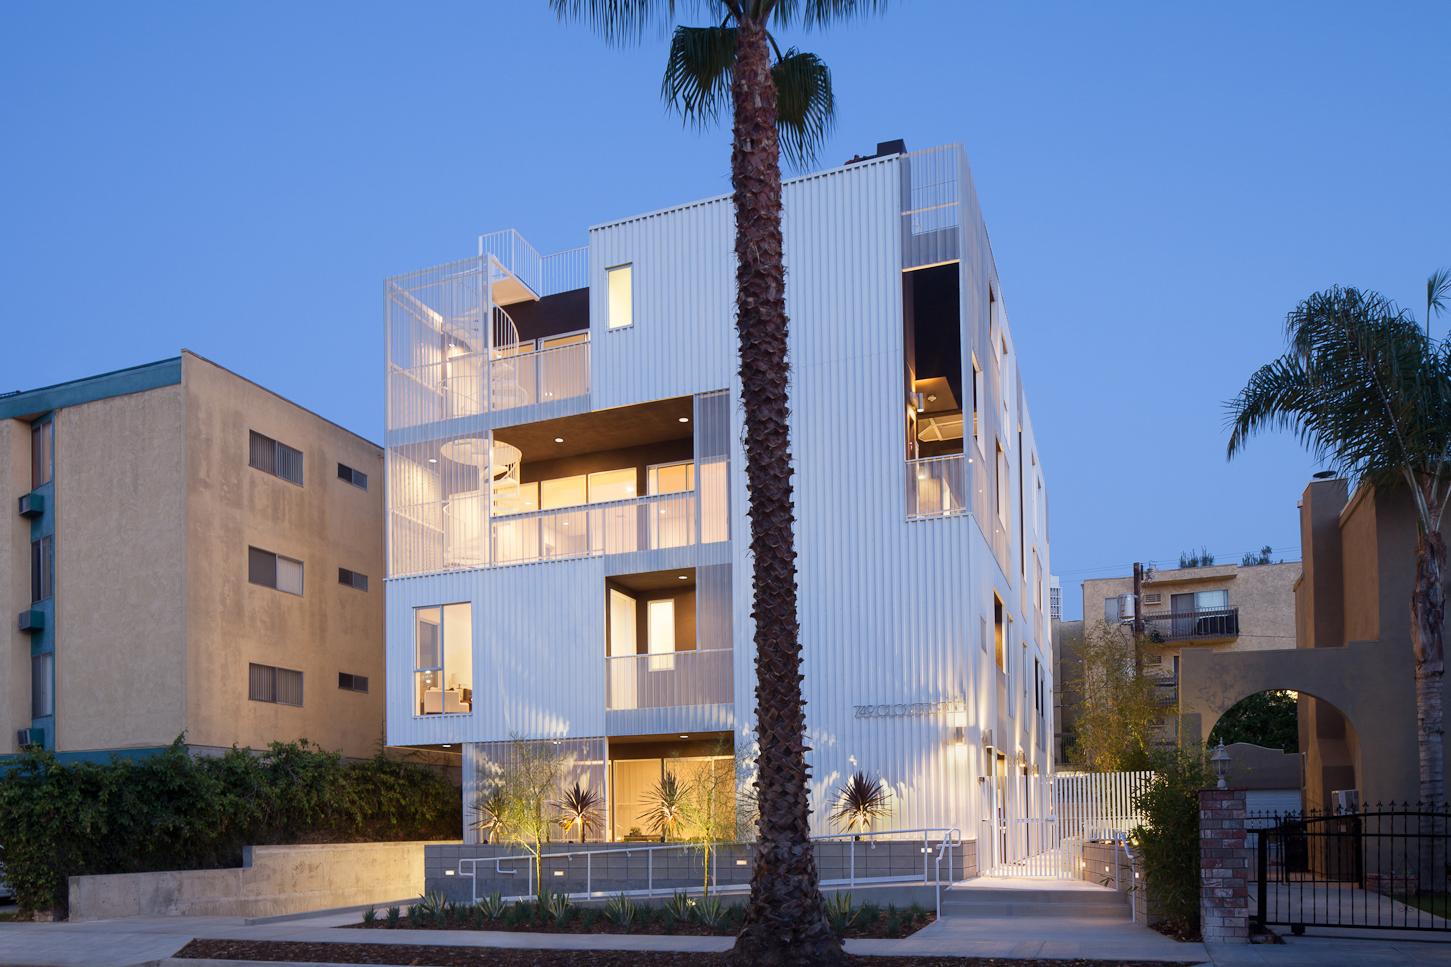 Cloverdale749 architect magazine lorcan o 39 herlihy - Residence calistoga strening architects californie ...